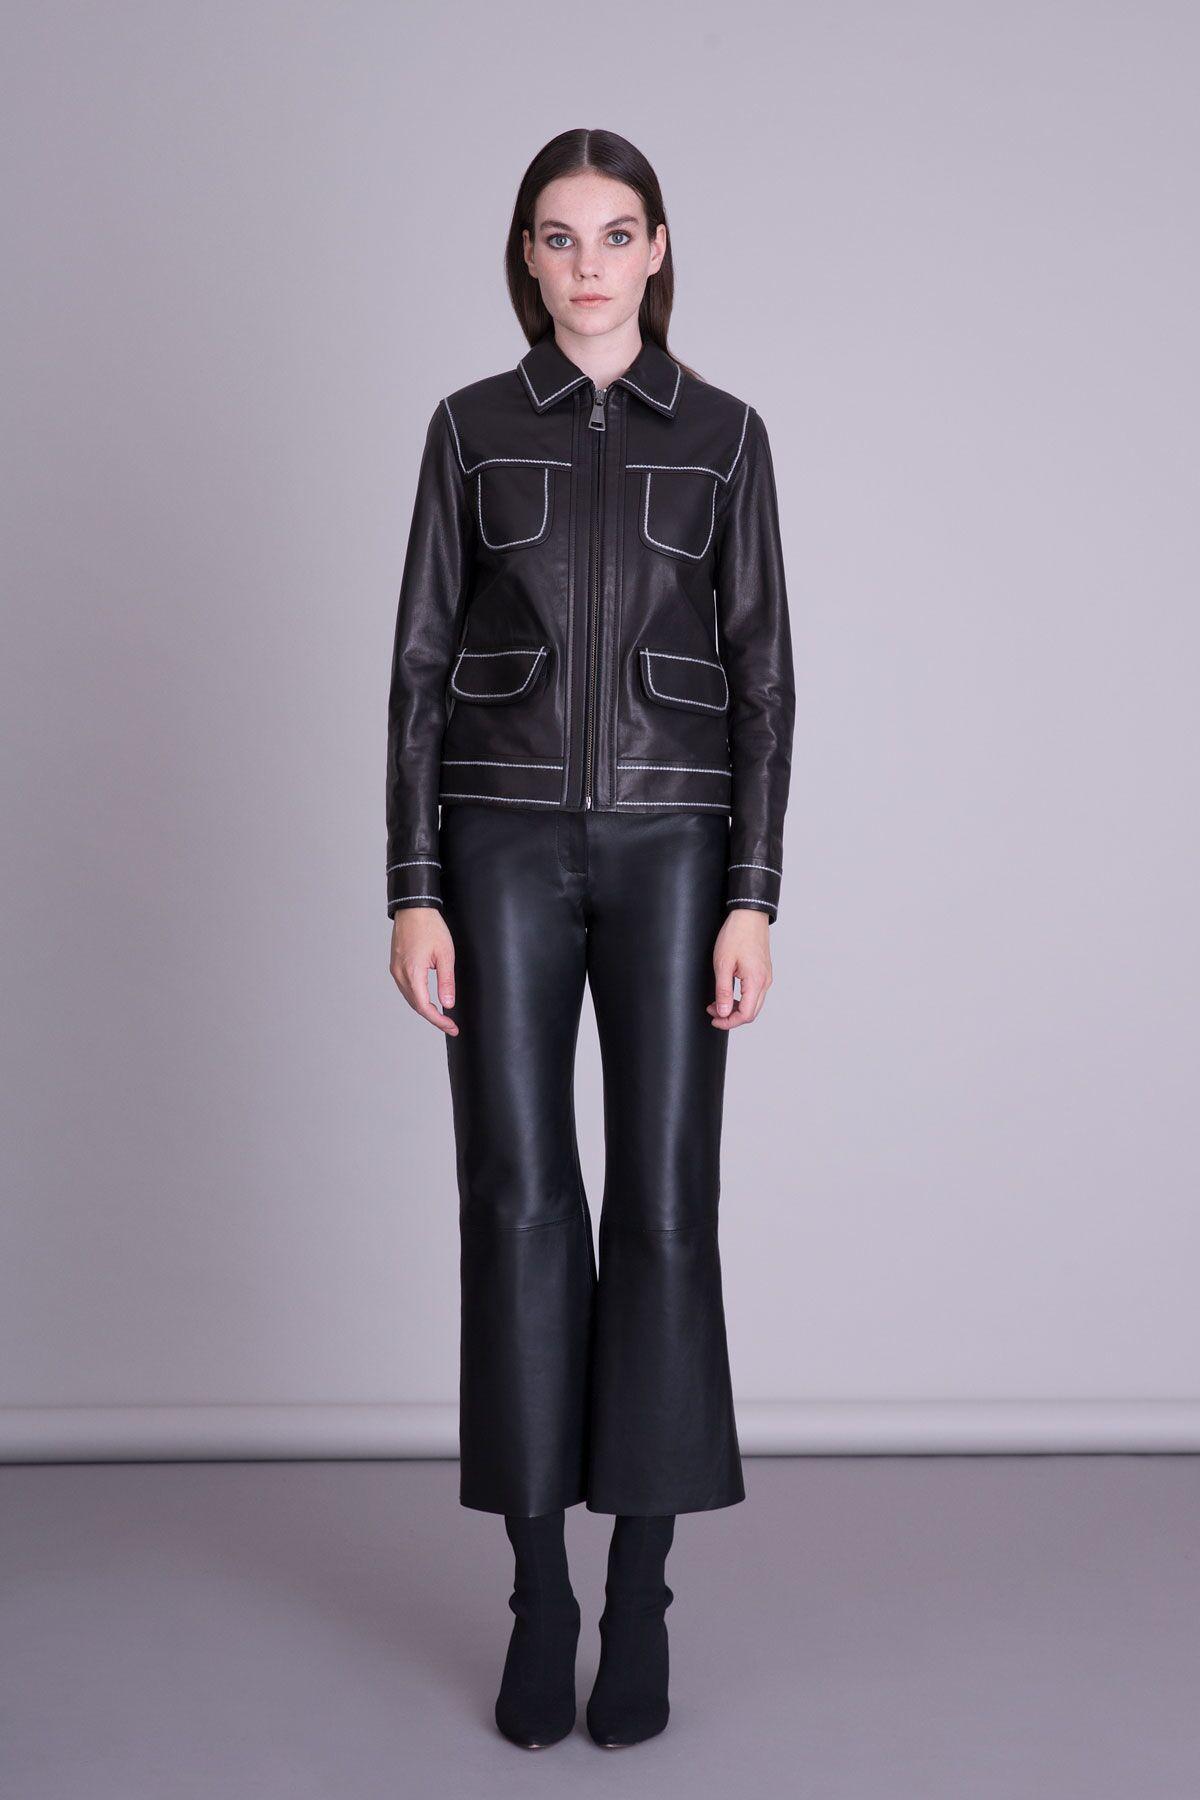 Striped Leather Jacket